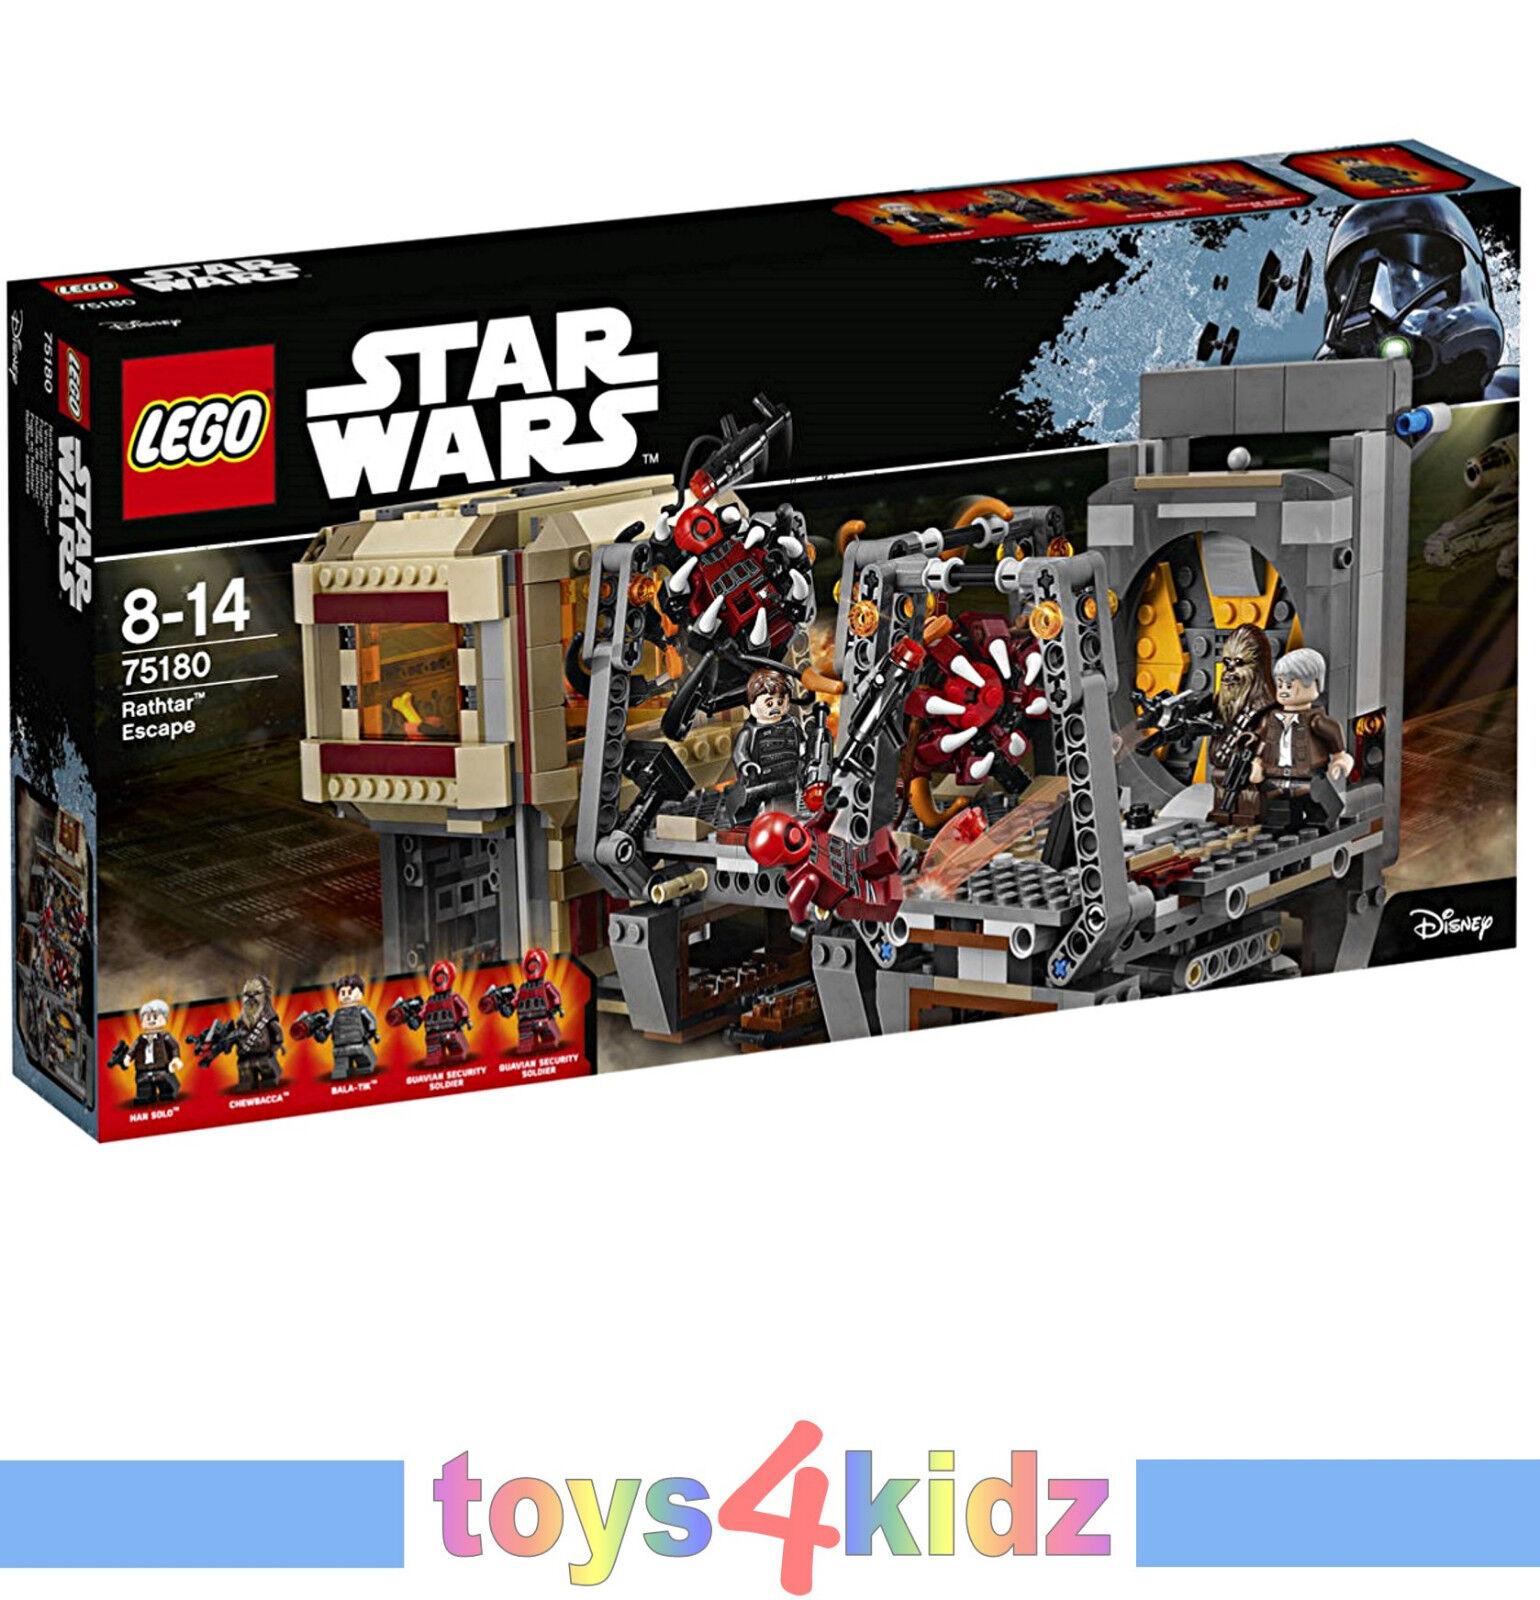 LEGO® STAR WARS™ WARS™ WARS™ 75180 Rathtar™ Escape   NEU   OVP   04cebc